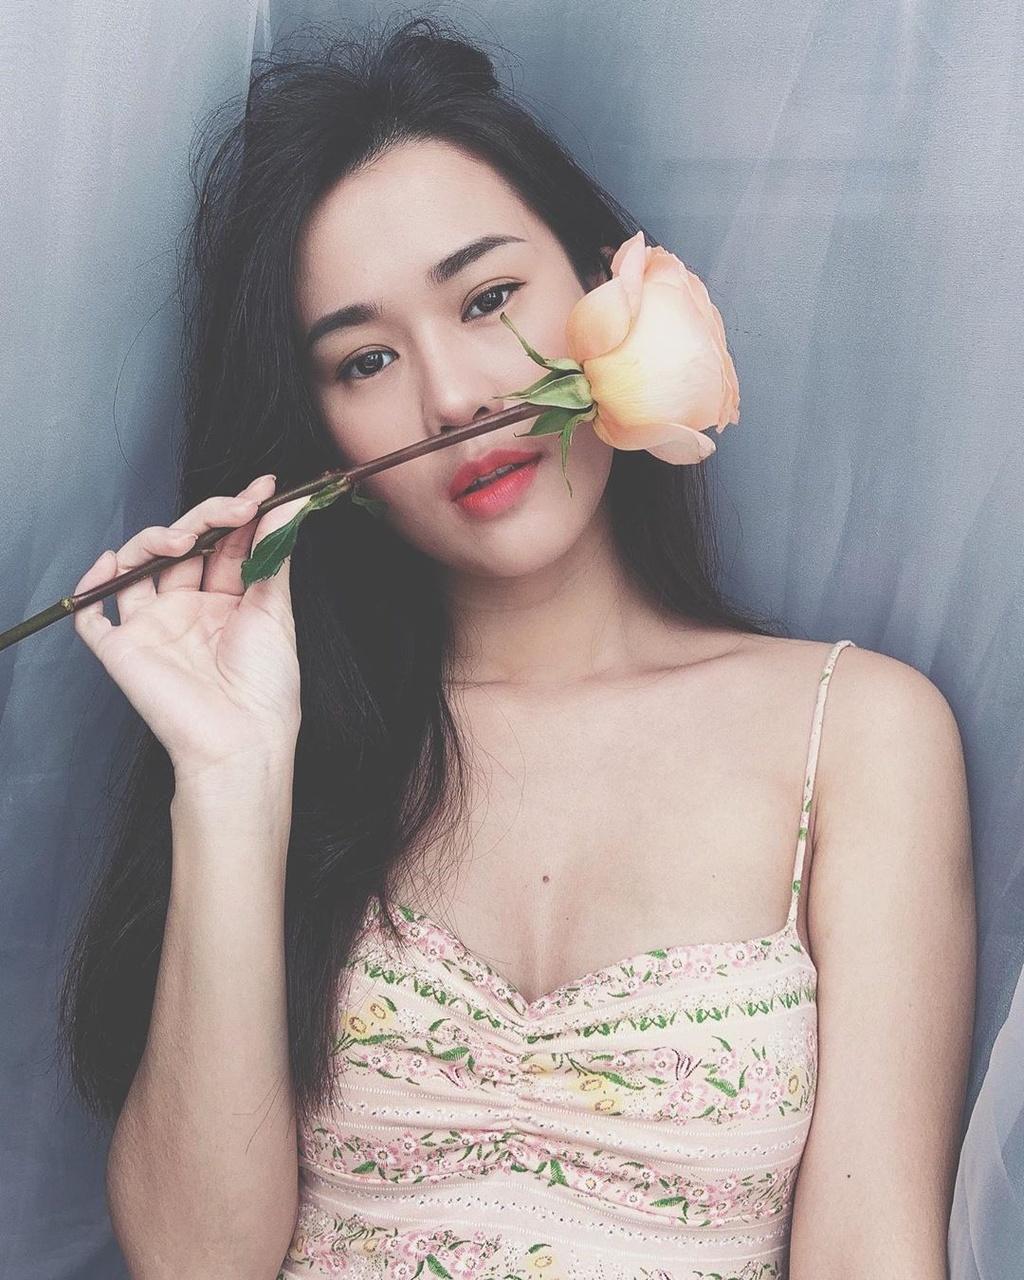 Hoi hot girl sinh nam 1990 ly hon, lan dan tinh duyen hinh anh 2